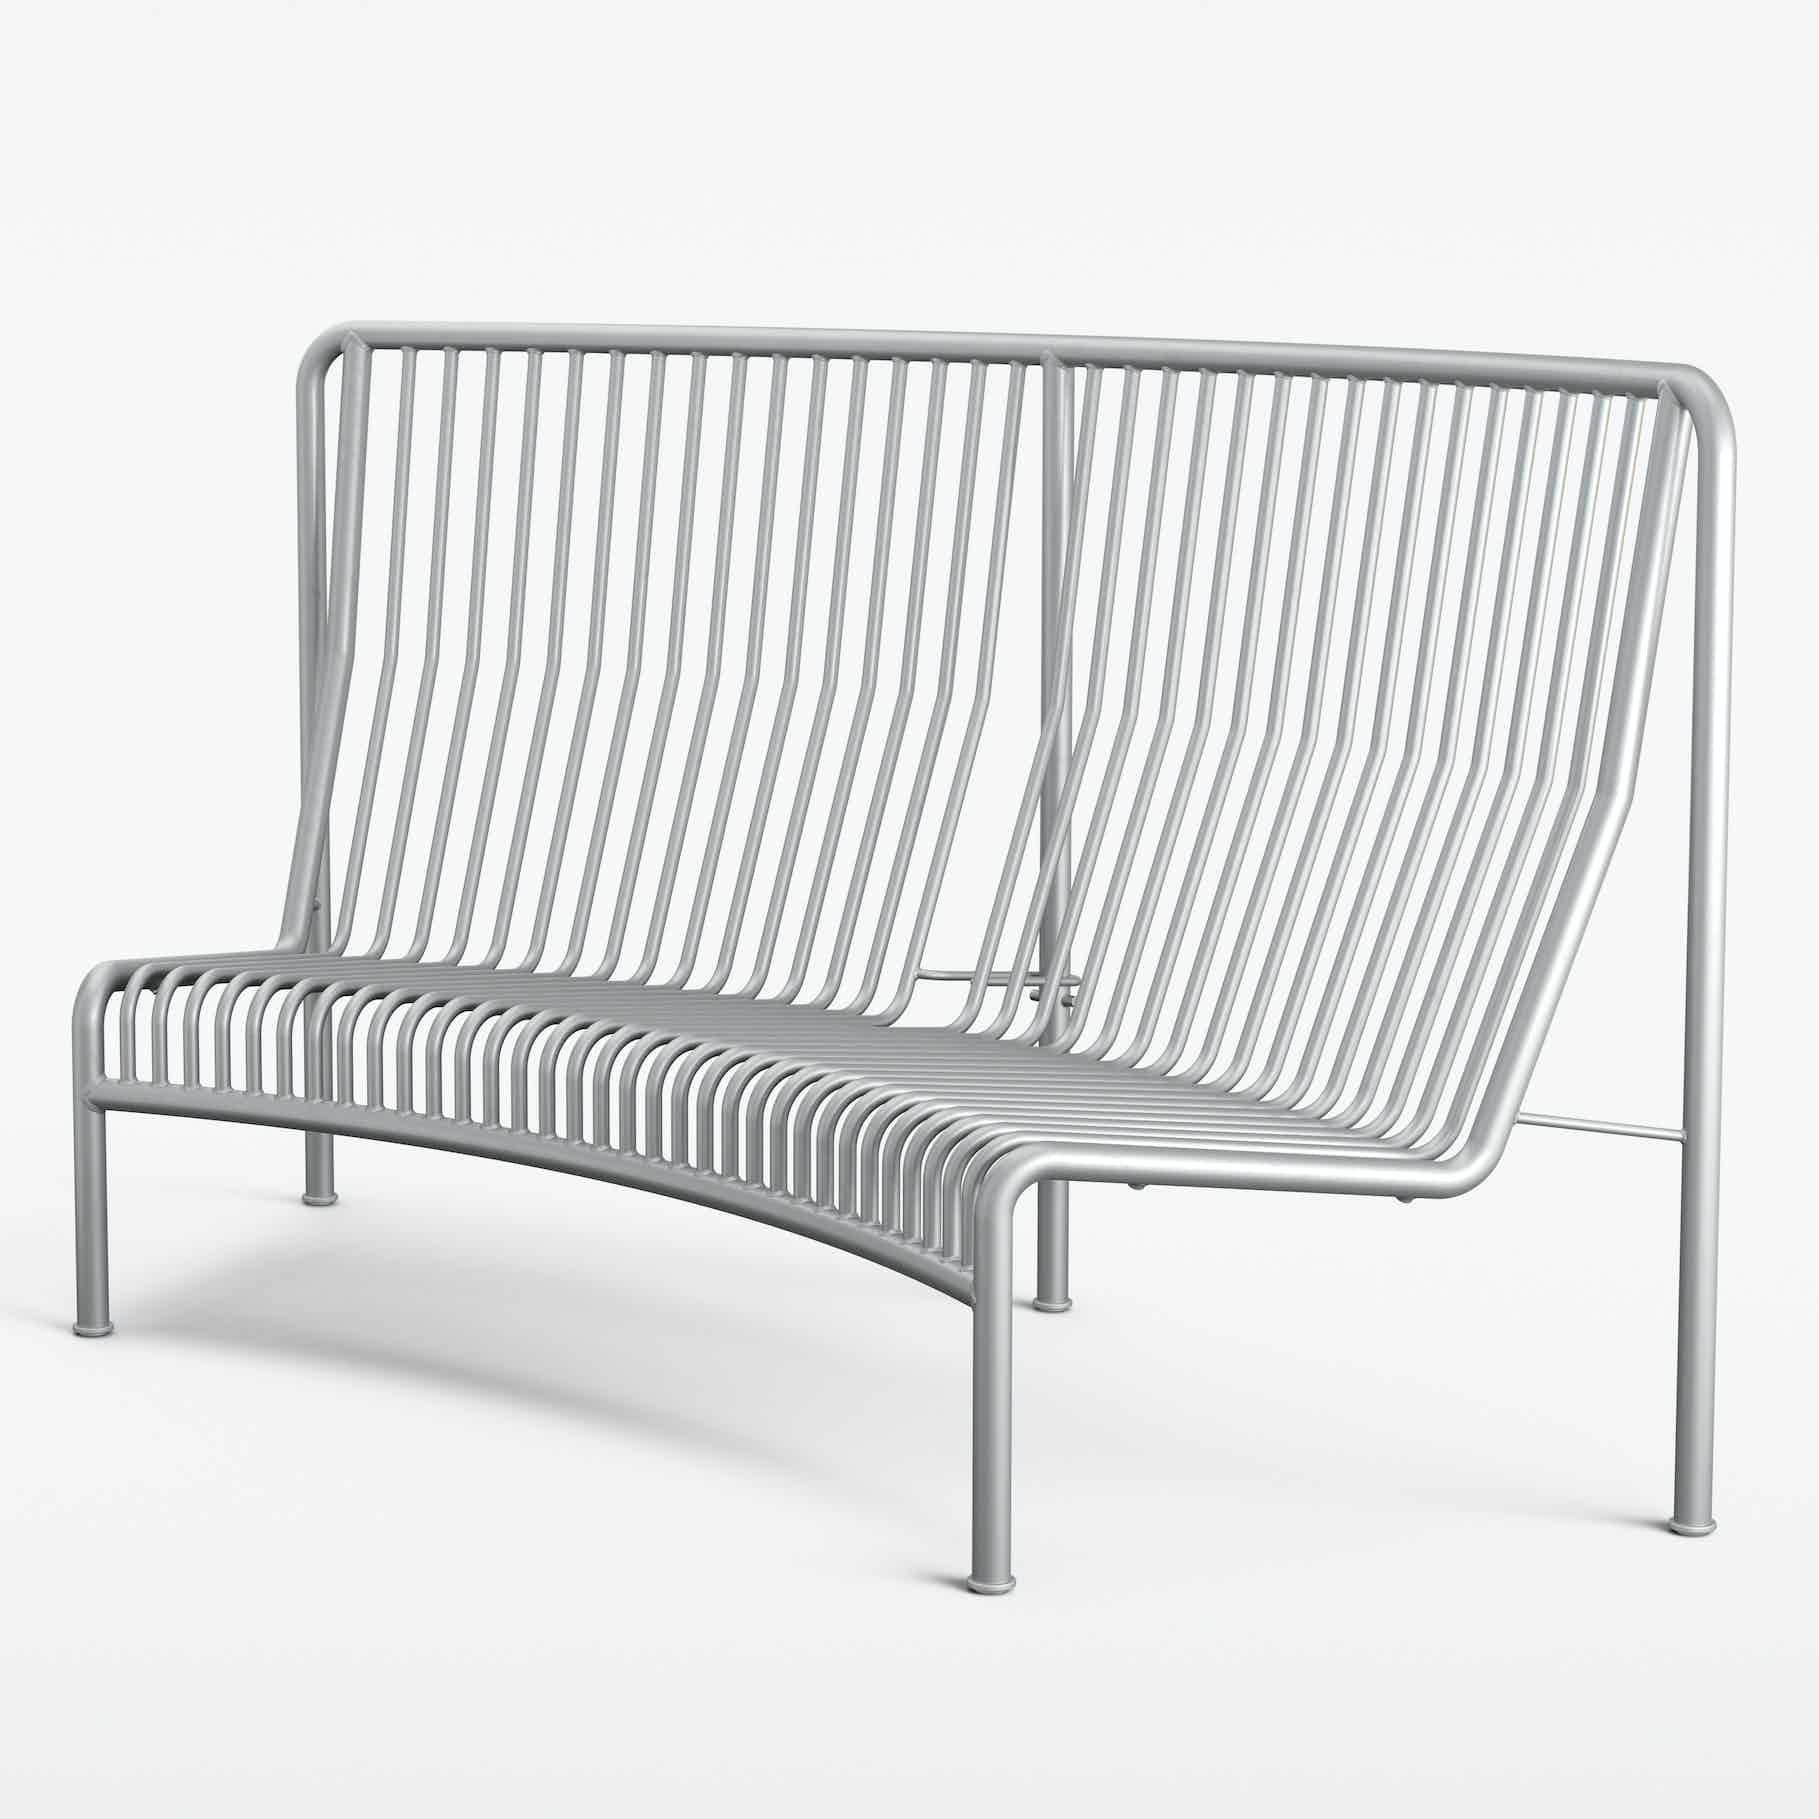 Massproductions roadie bench haute living